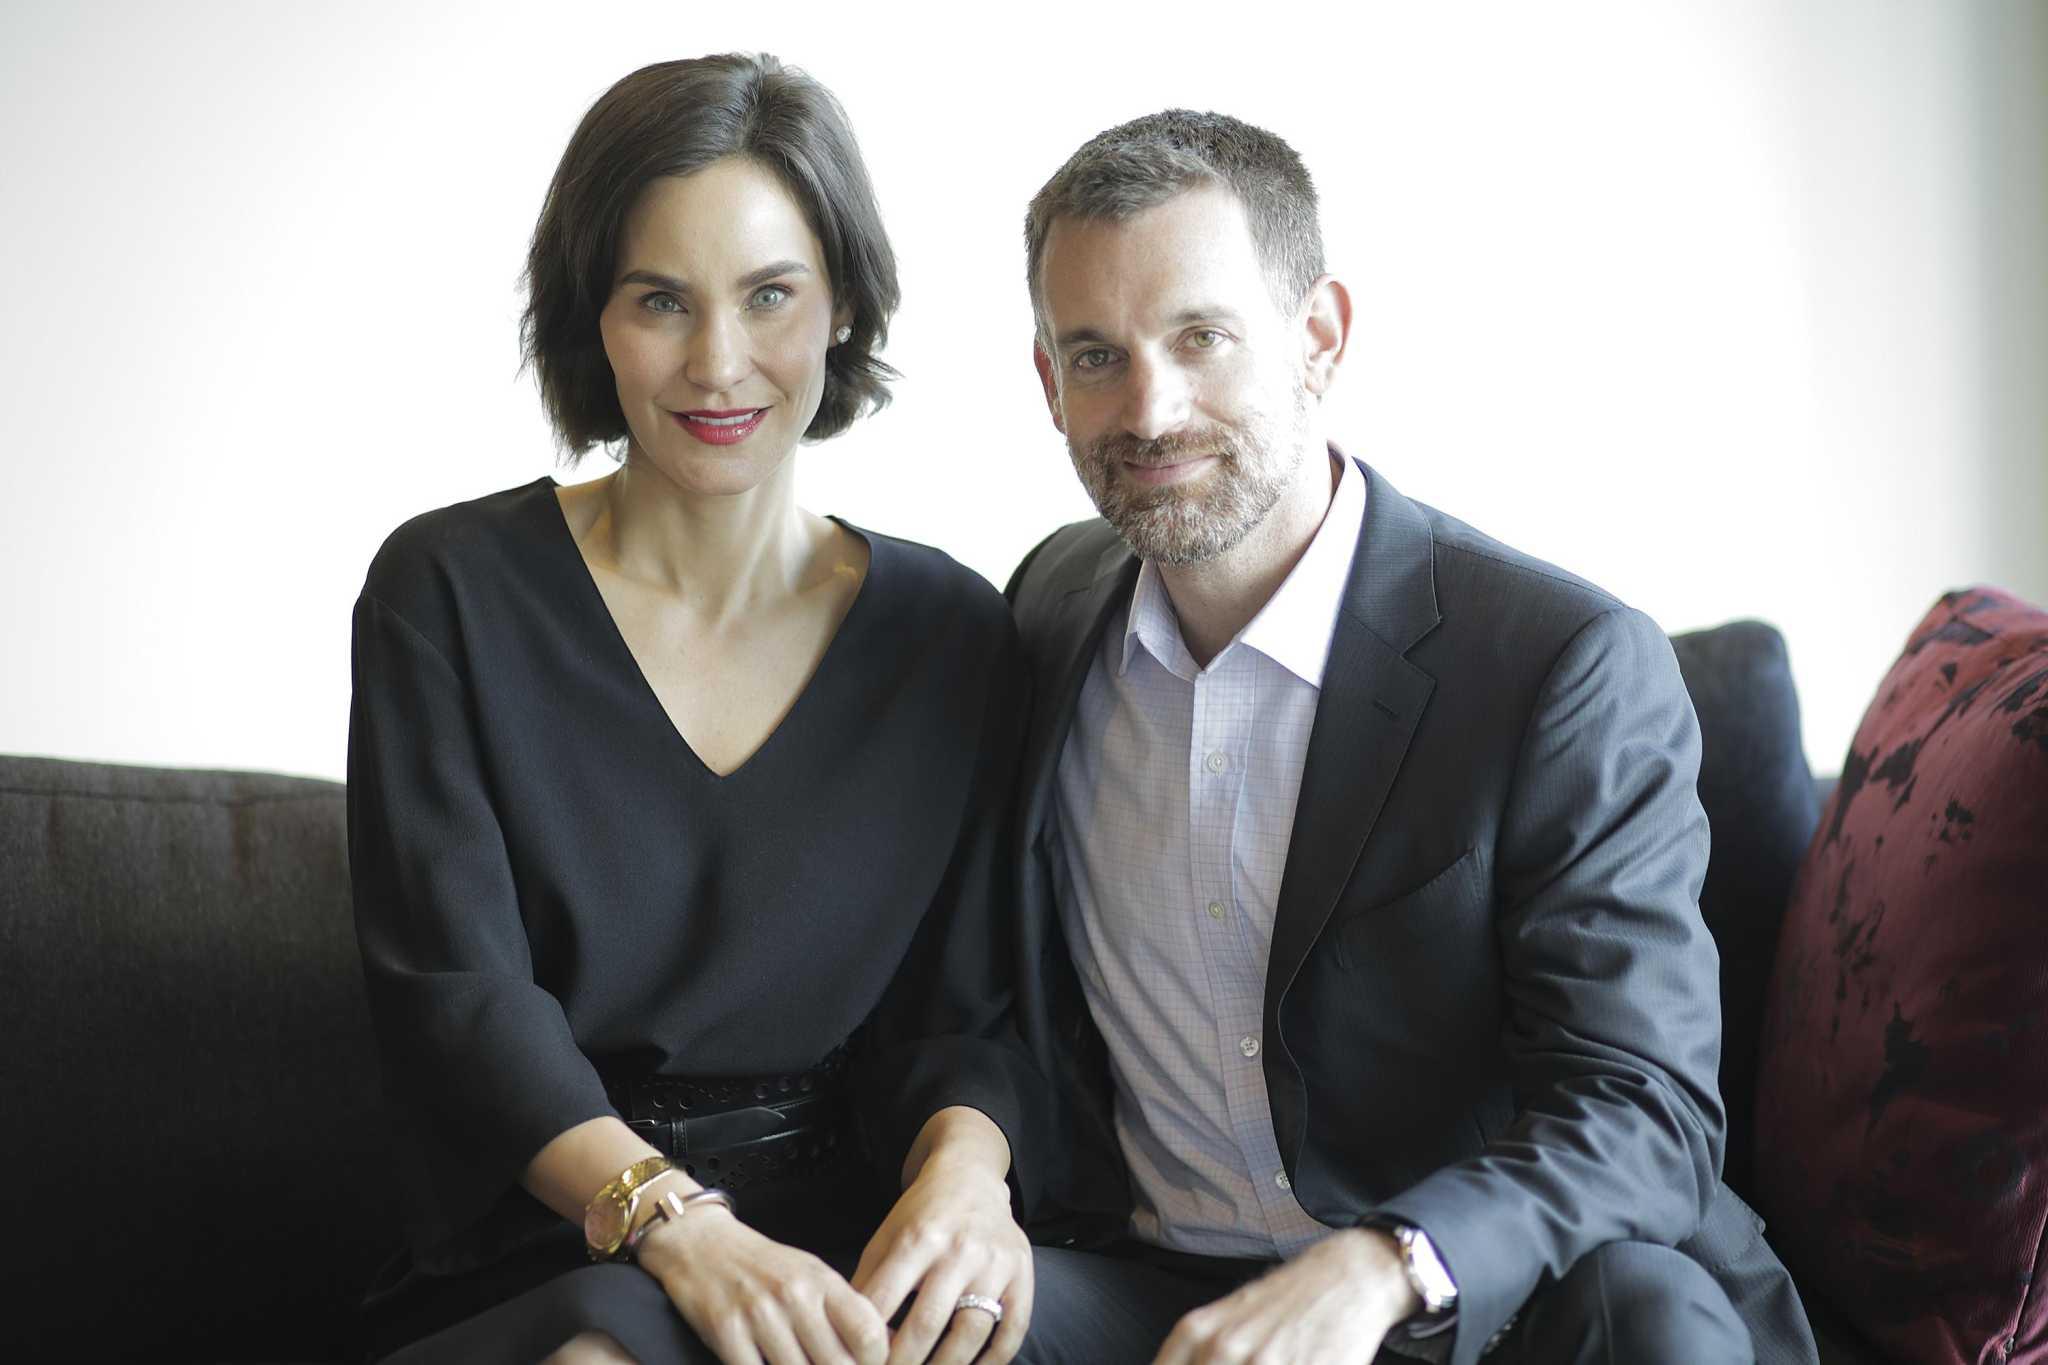 houston billionaire couple unveil plan to fight high drug